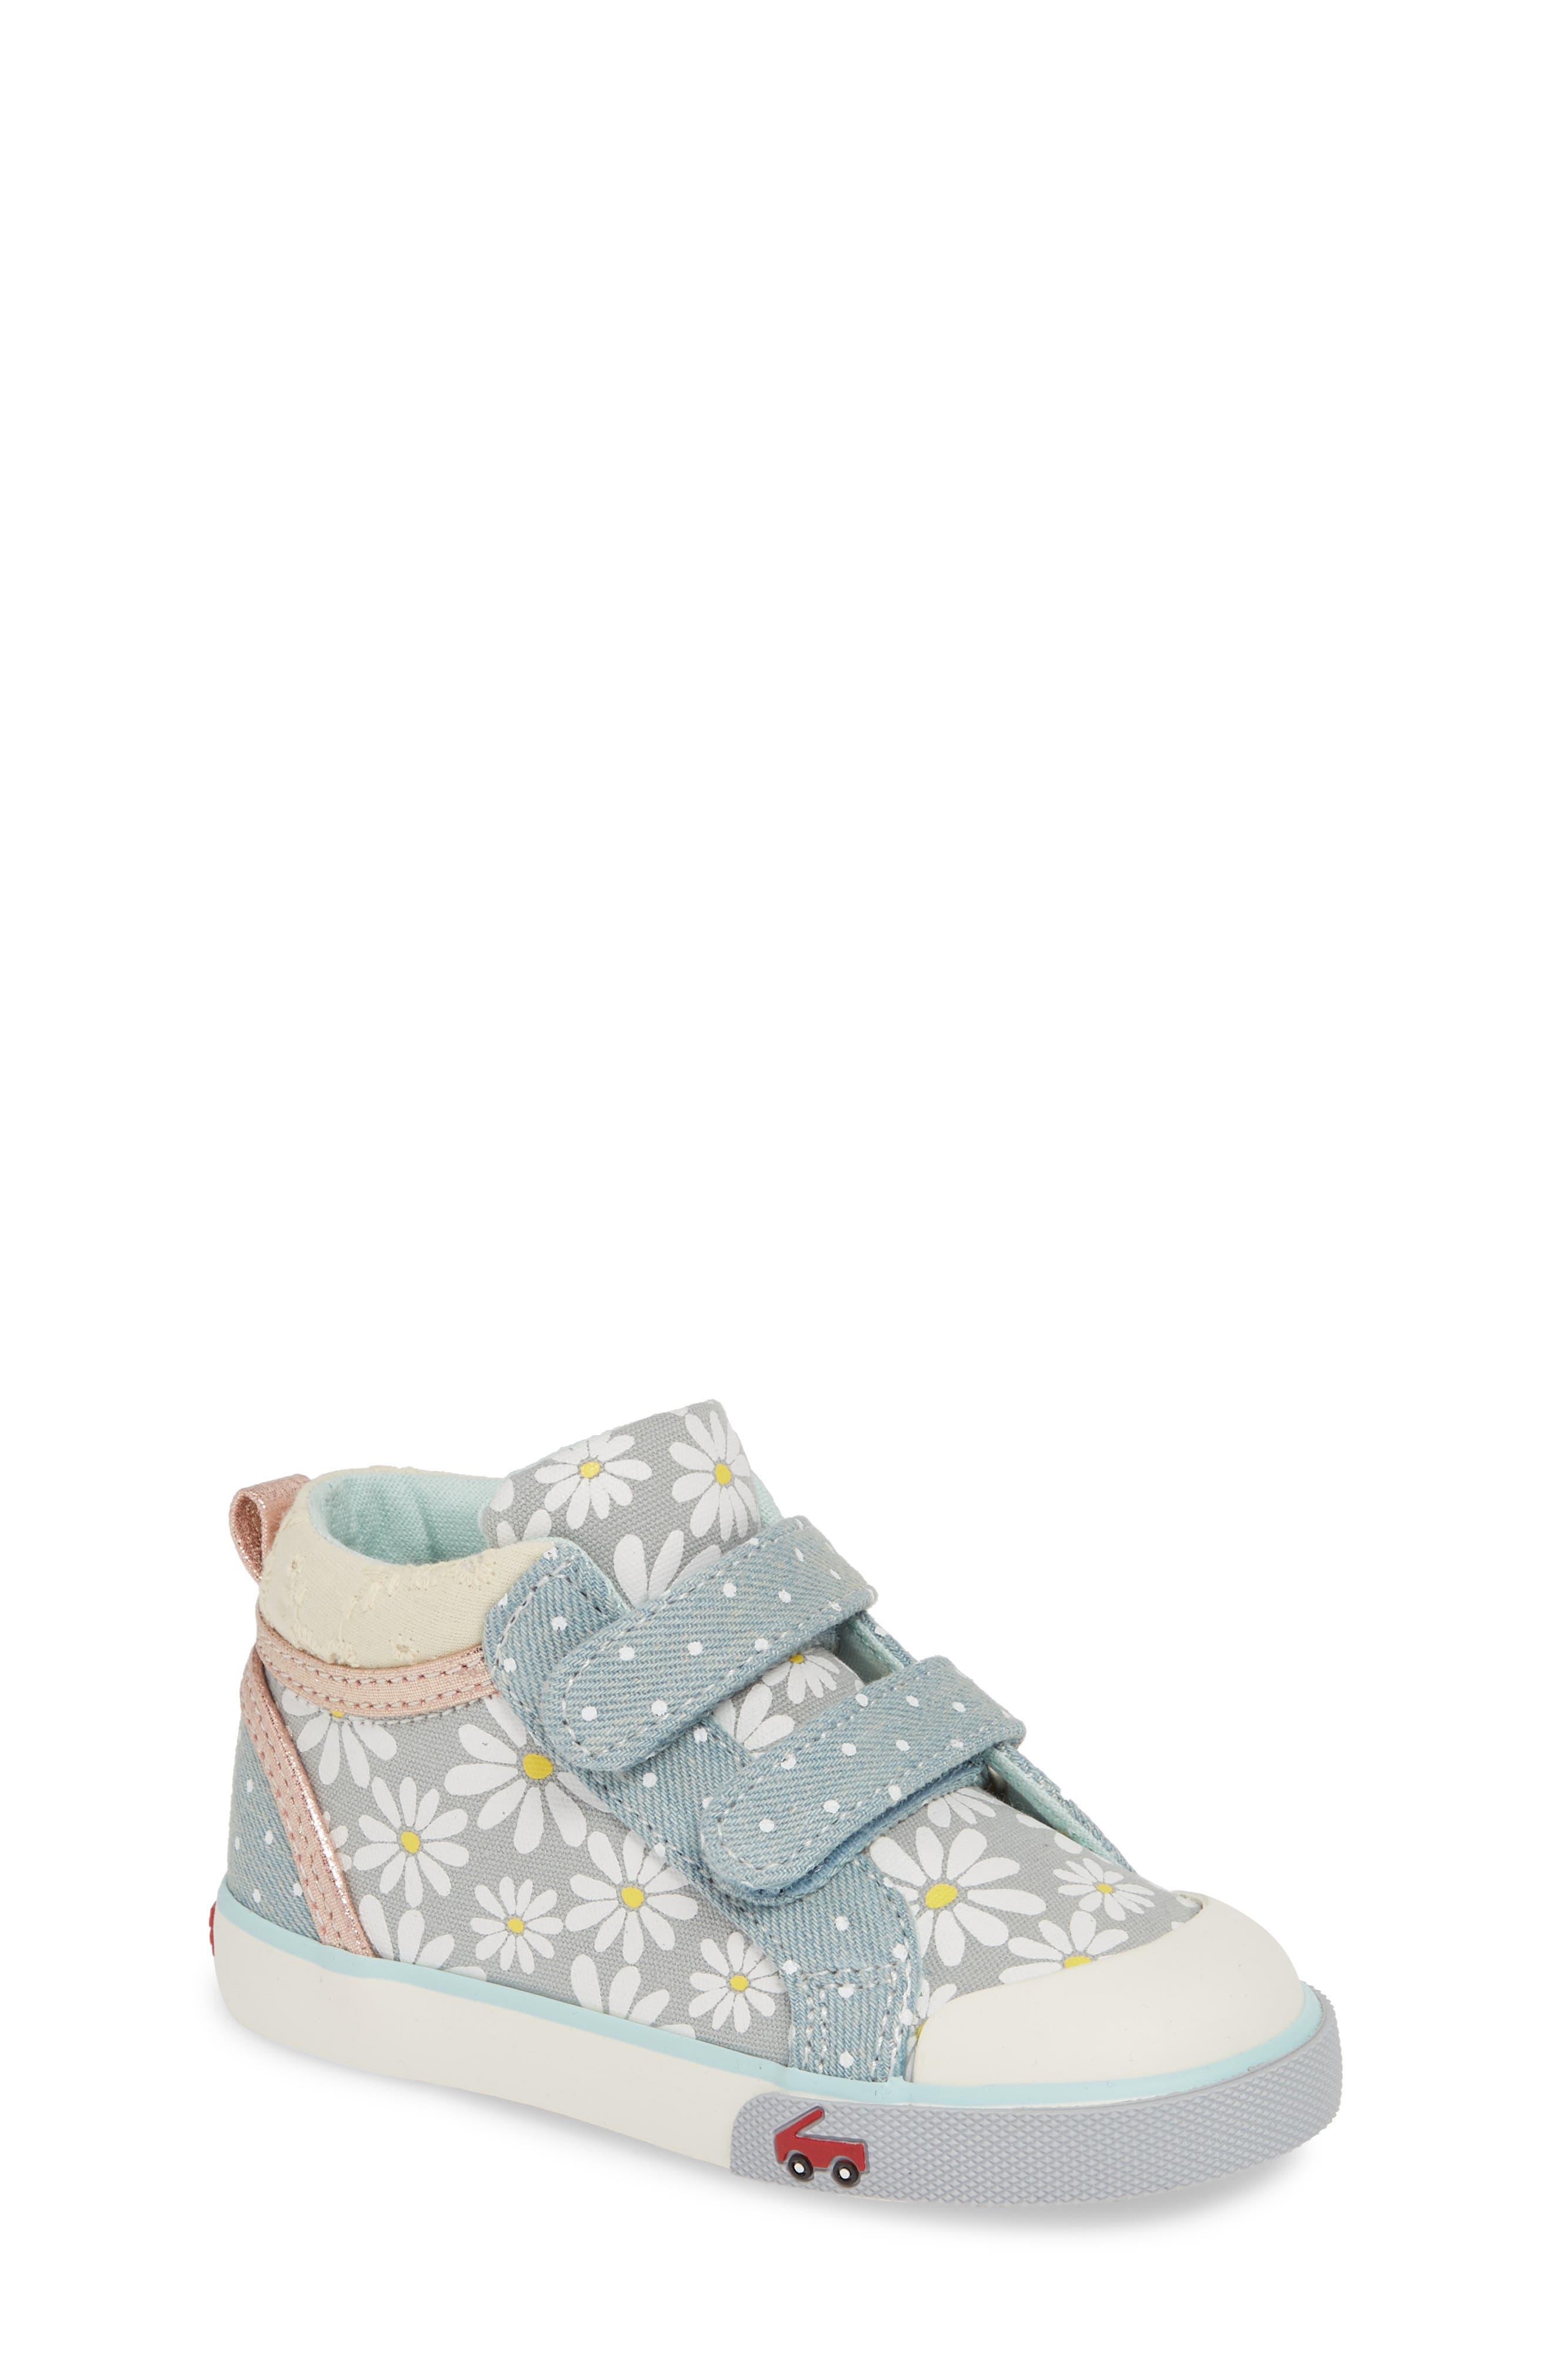 SEE KAI RUN Kya Sneaker, Main, color, GRAY DAISY